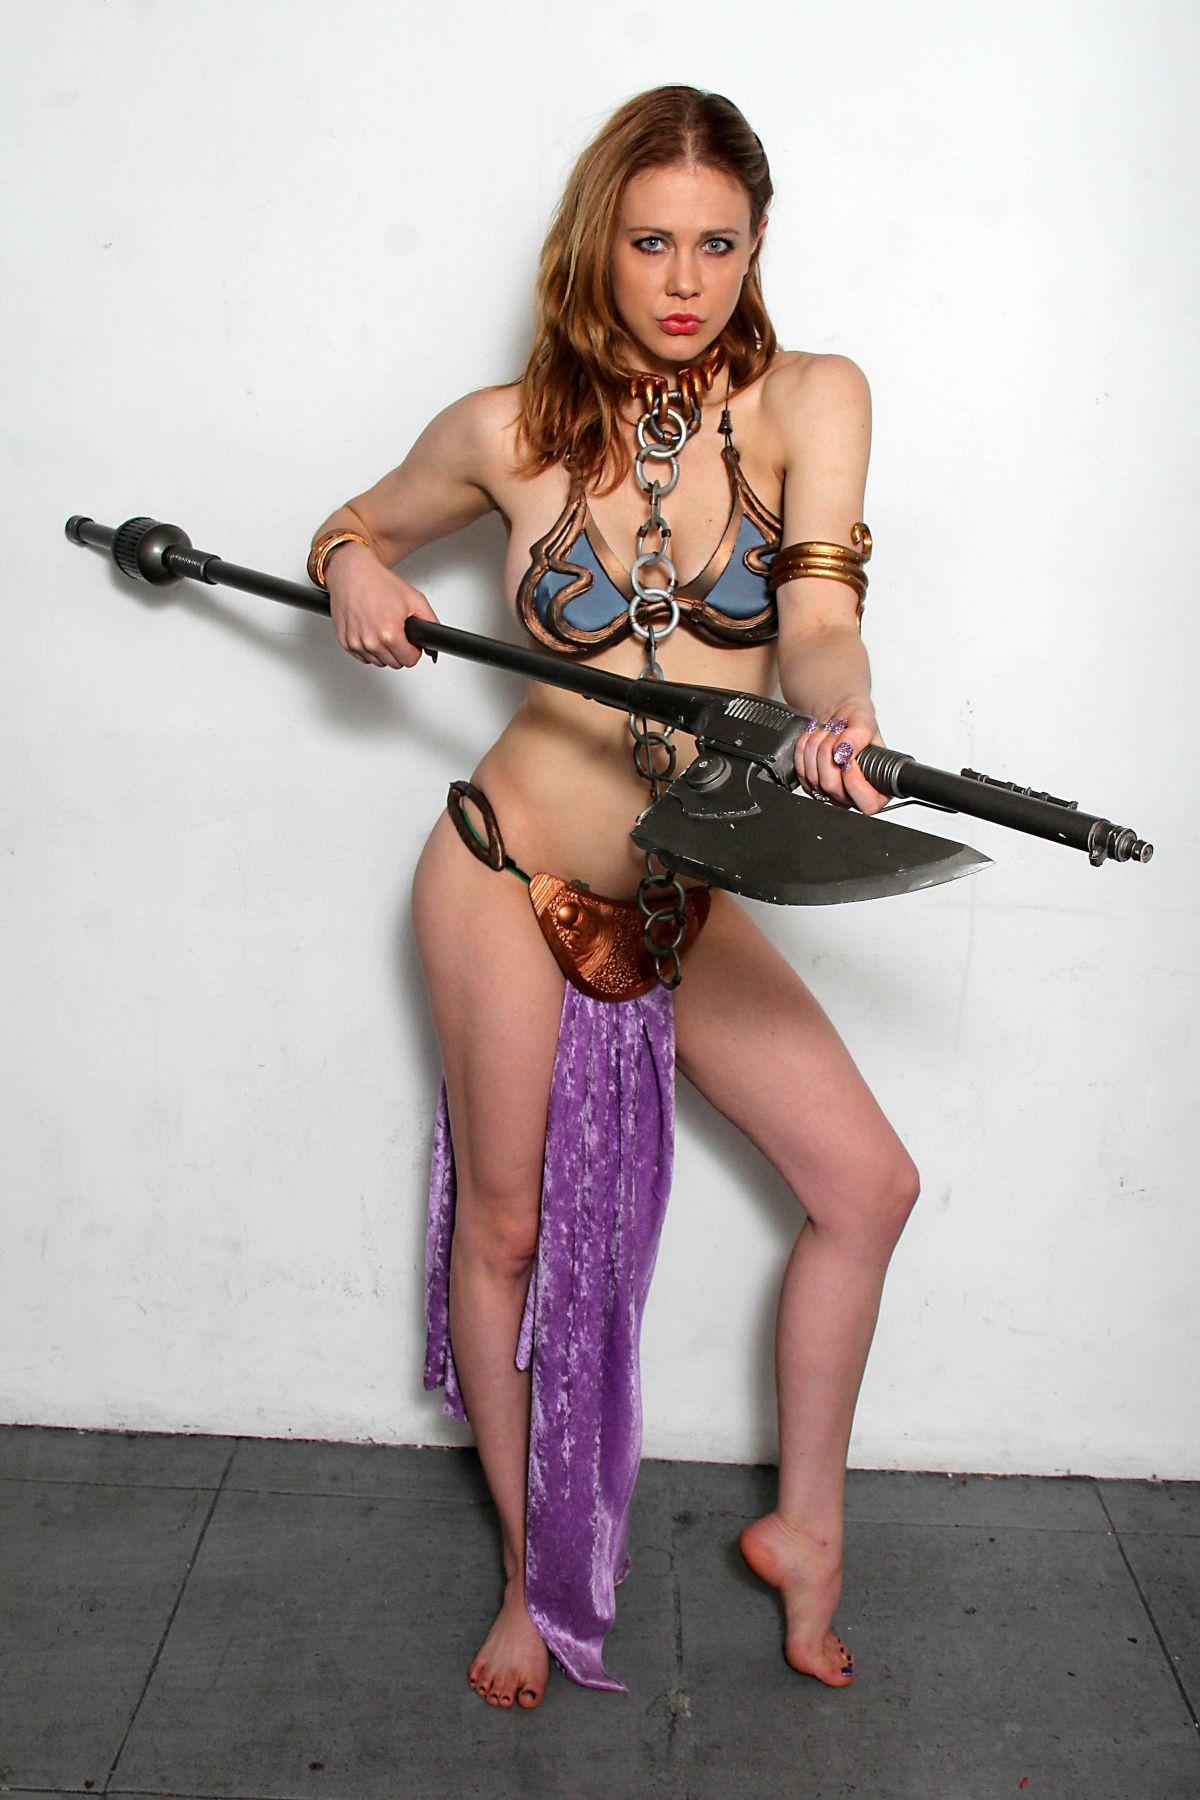 maitland-ward-princess-leia-photoshoot-at-meltdown-comics-in-los-angeles_12.jpg (JPEG 画像, 1200x1800 px) - 表示倍率 (50%)